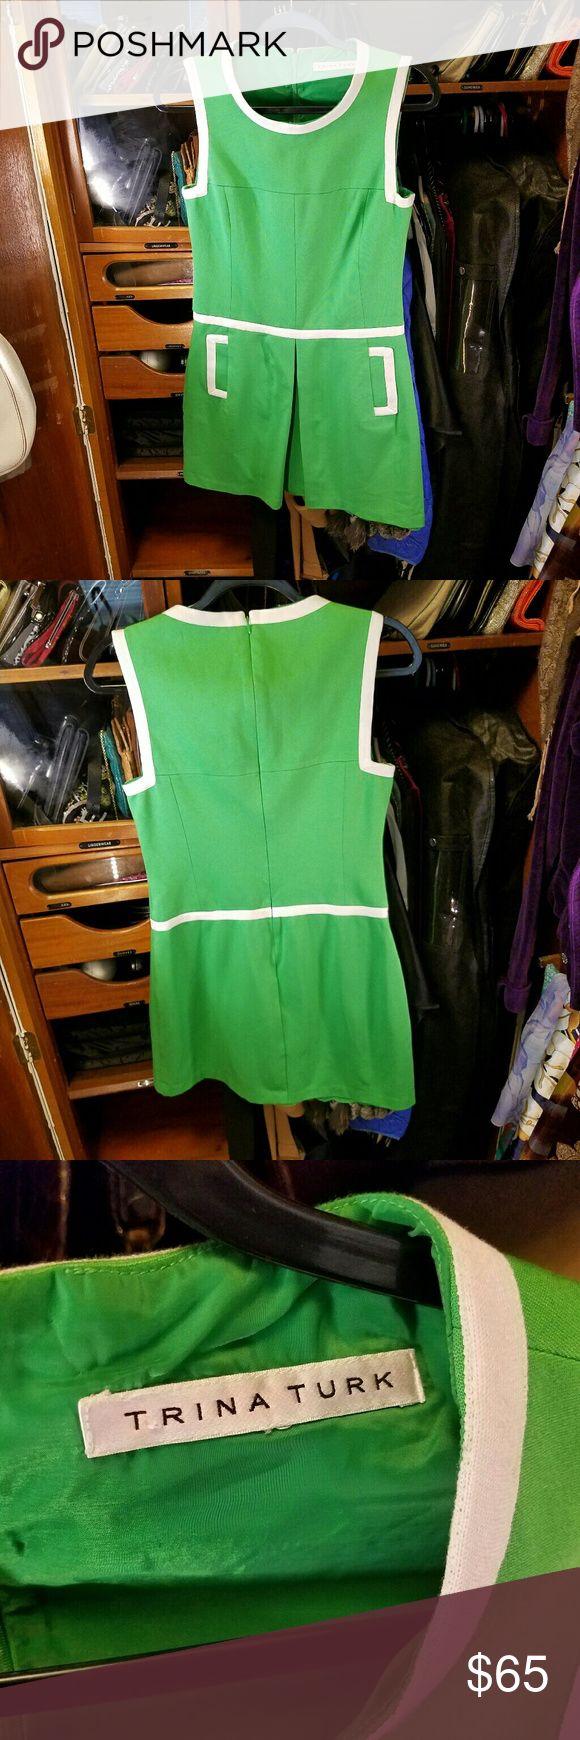 TRINA TURK little green dress Kelly Green dress with skirt pleated in the middle.  Back hidden zipper. Slotted pockets. Trina Turk Dresses Mini